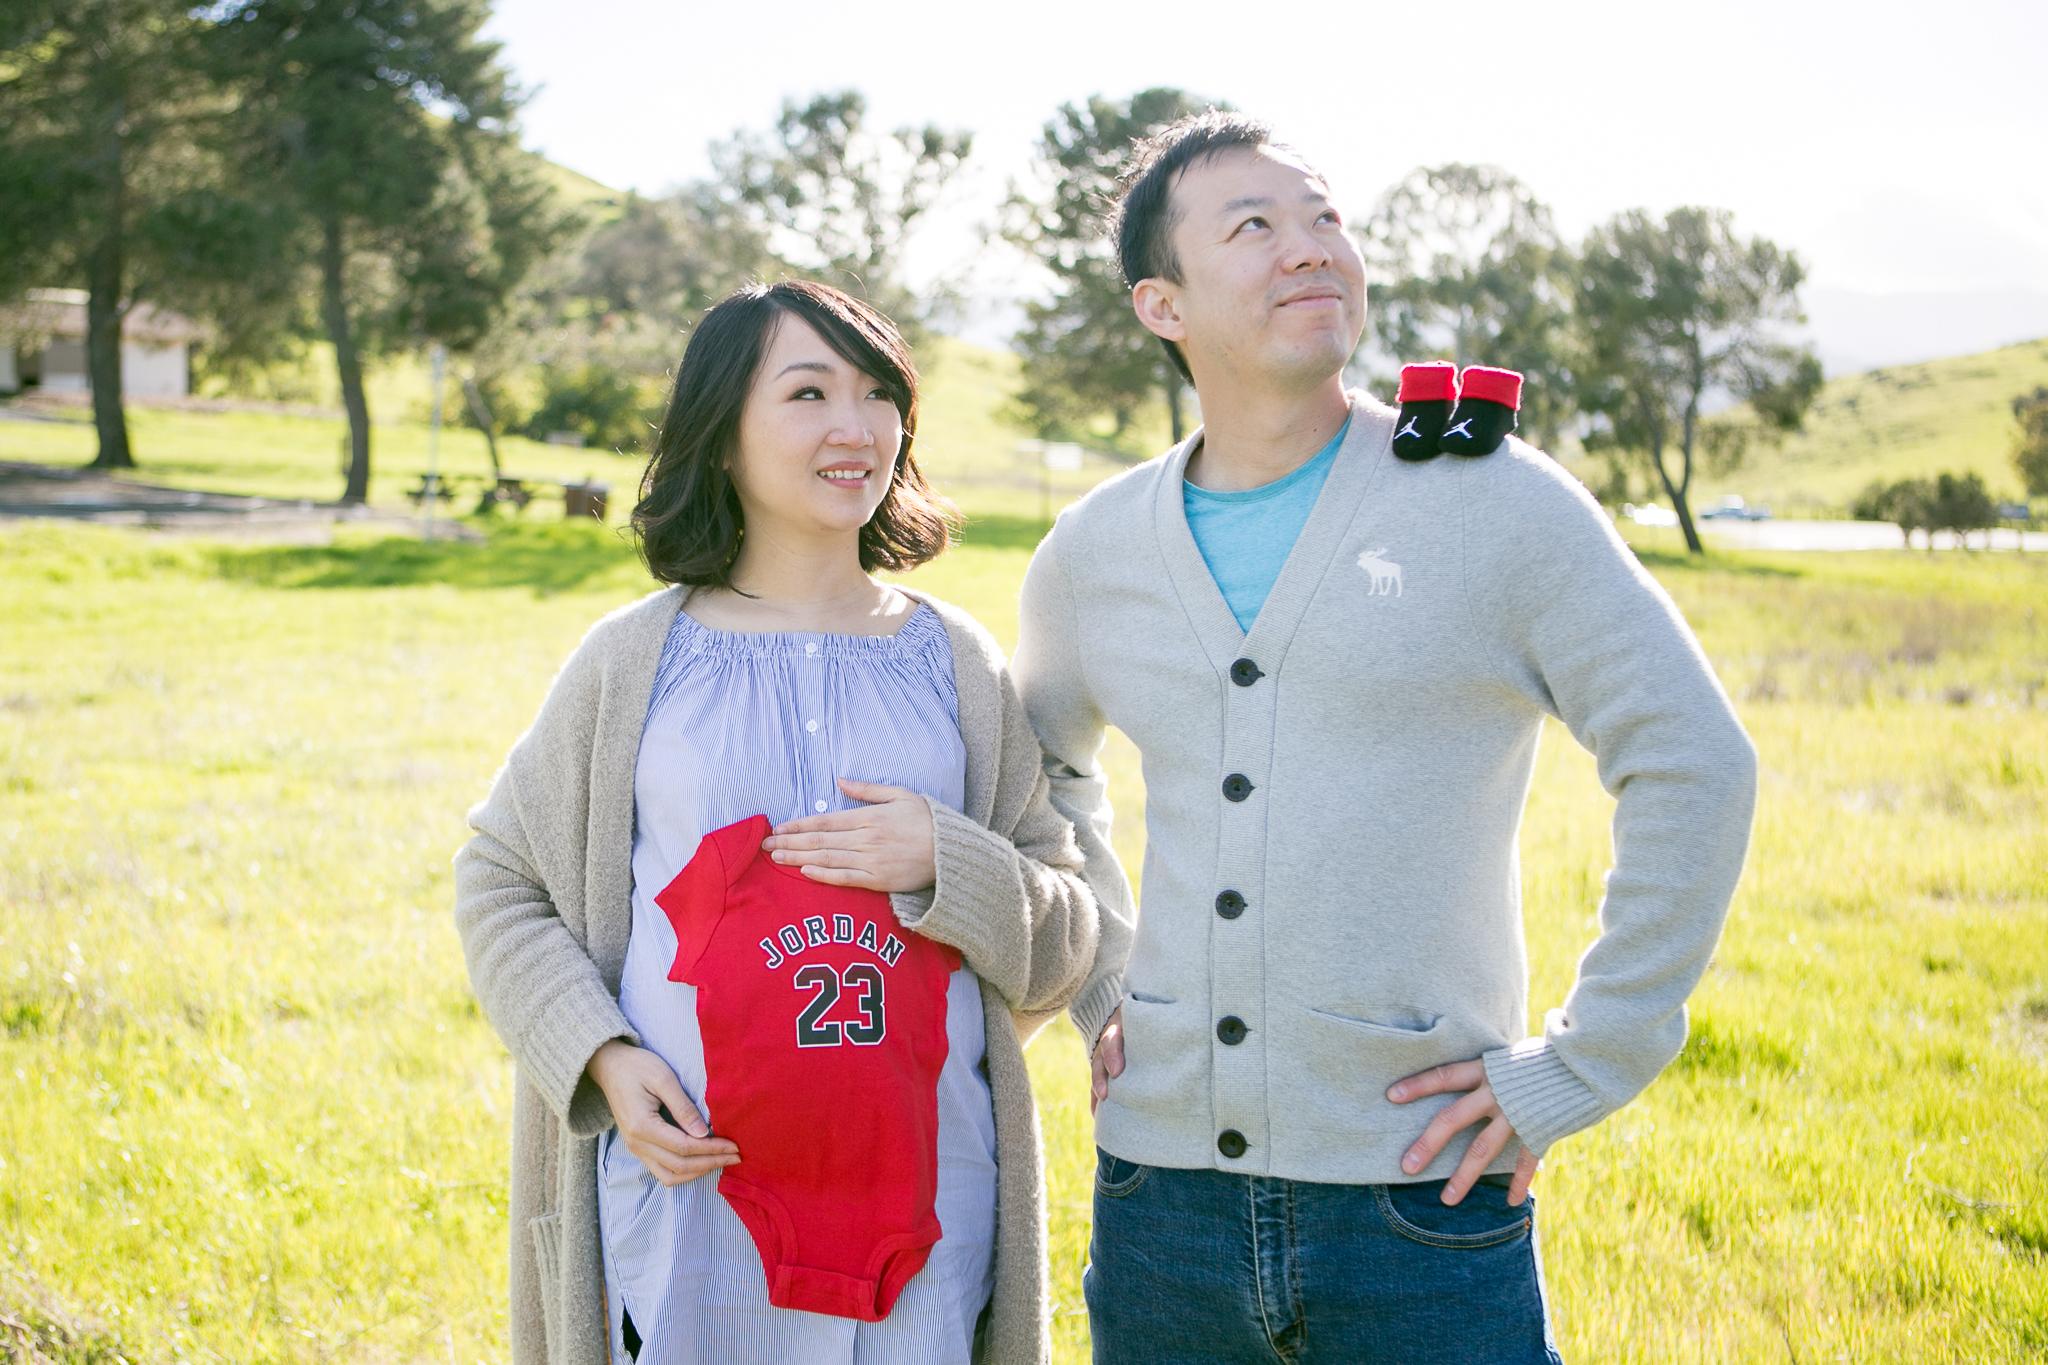 http://www.michellechangphotography.com/blog/2017/3/7/san-jose-maternity-photographer-ming-sandy-lucas